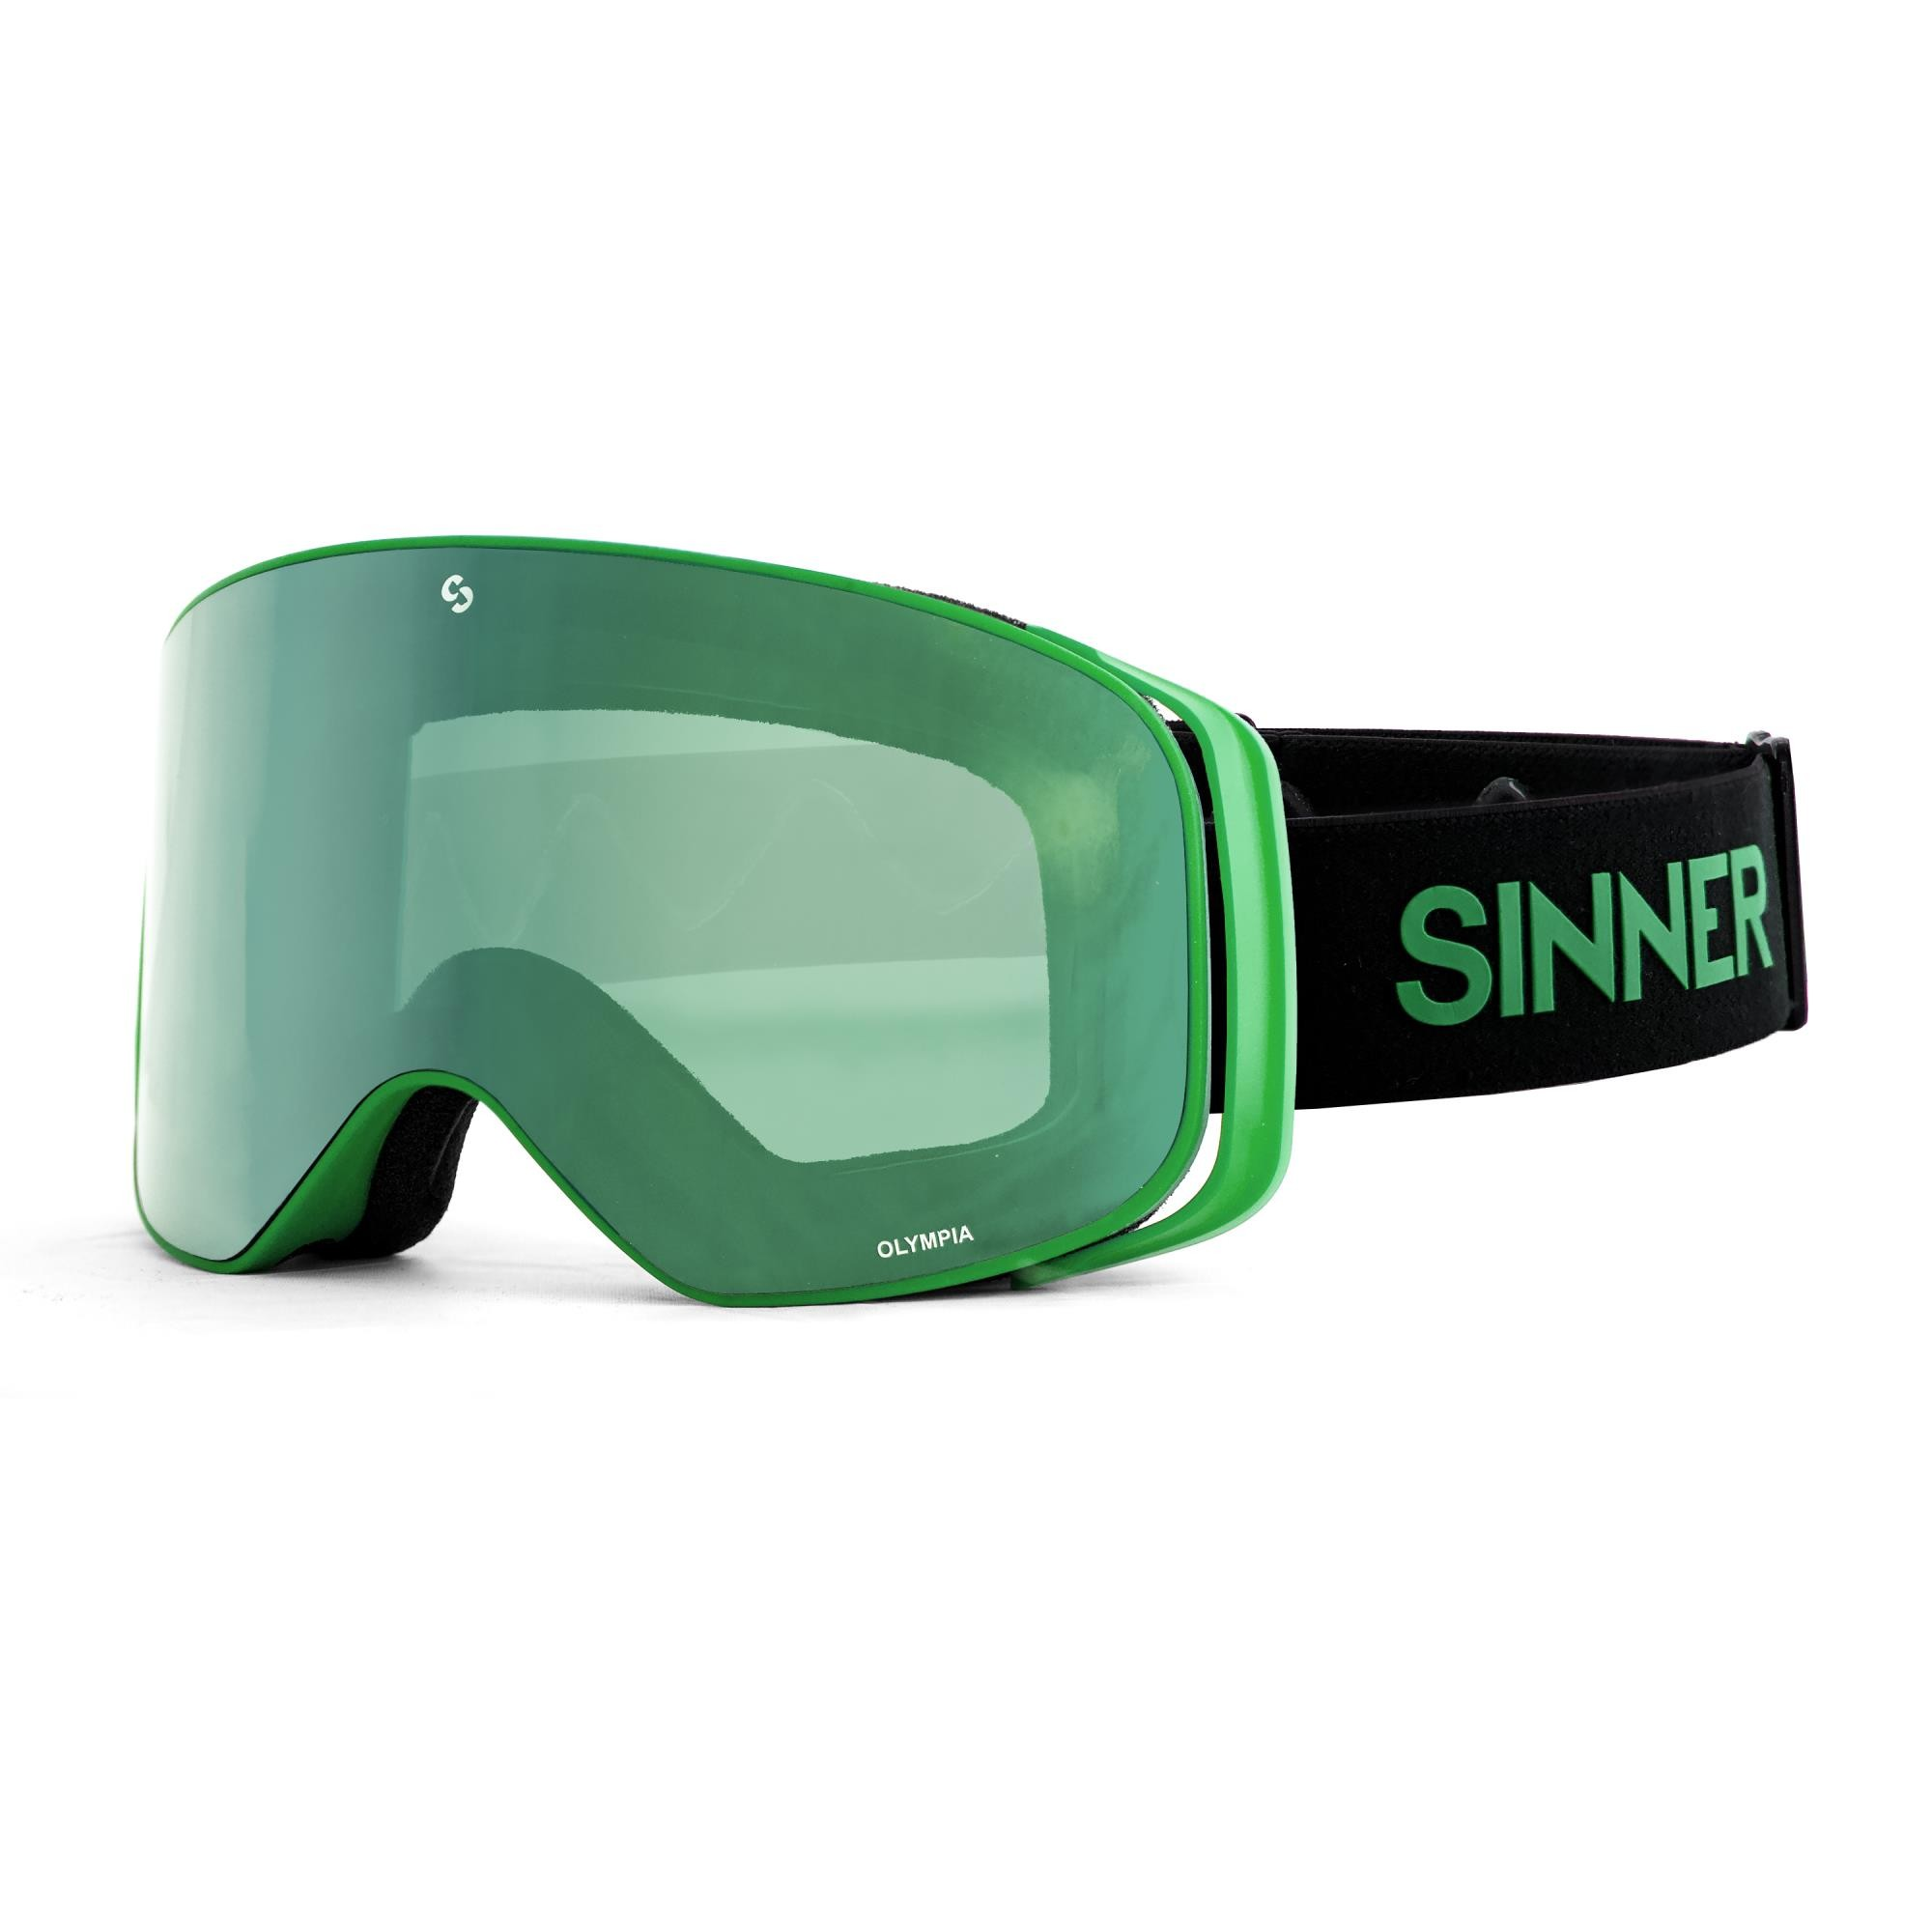 Sinner Olympia Skibril - Mat Groen - Volledig Groene Spiegellens